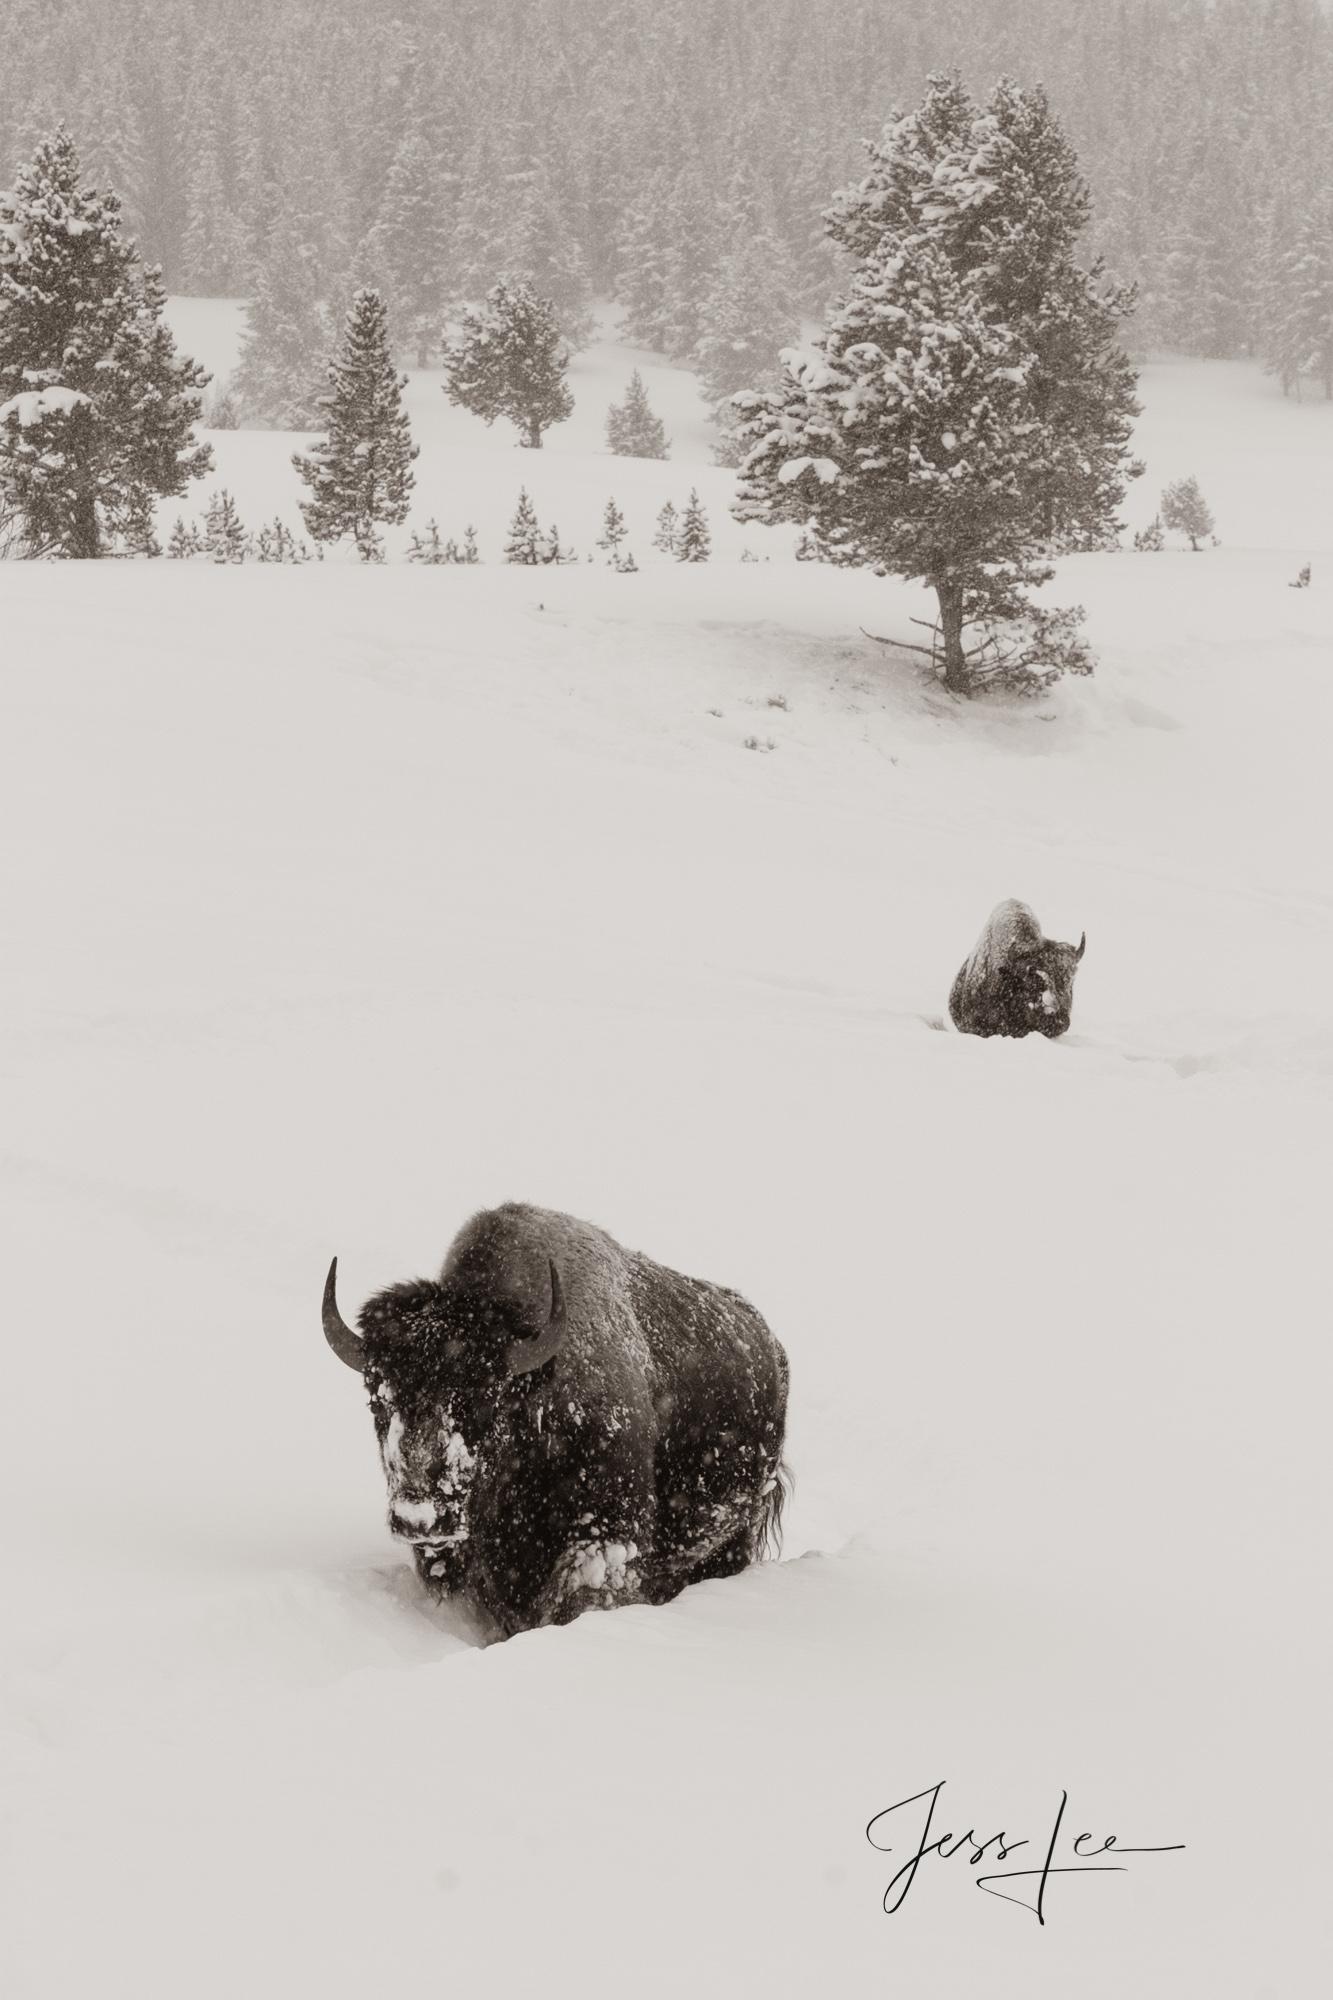 Bison walking in deep snow, photo